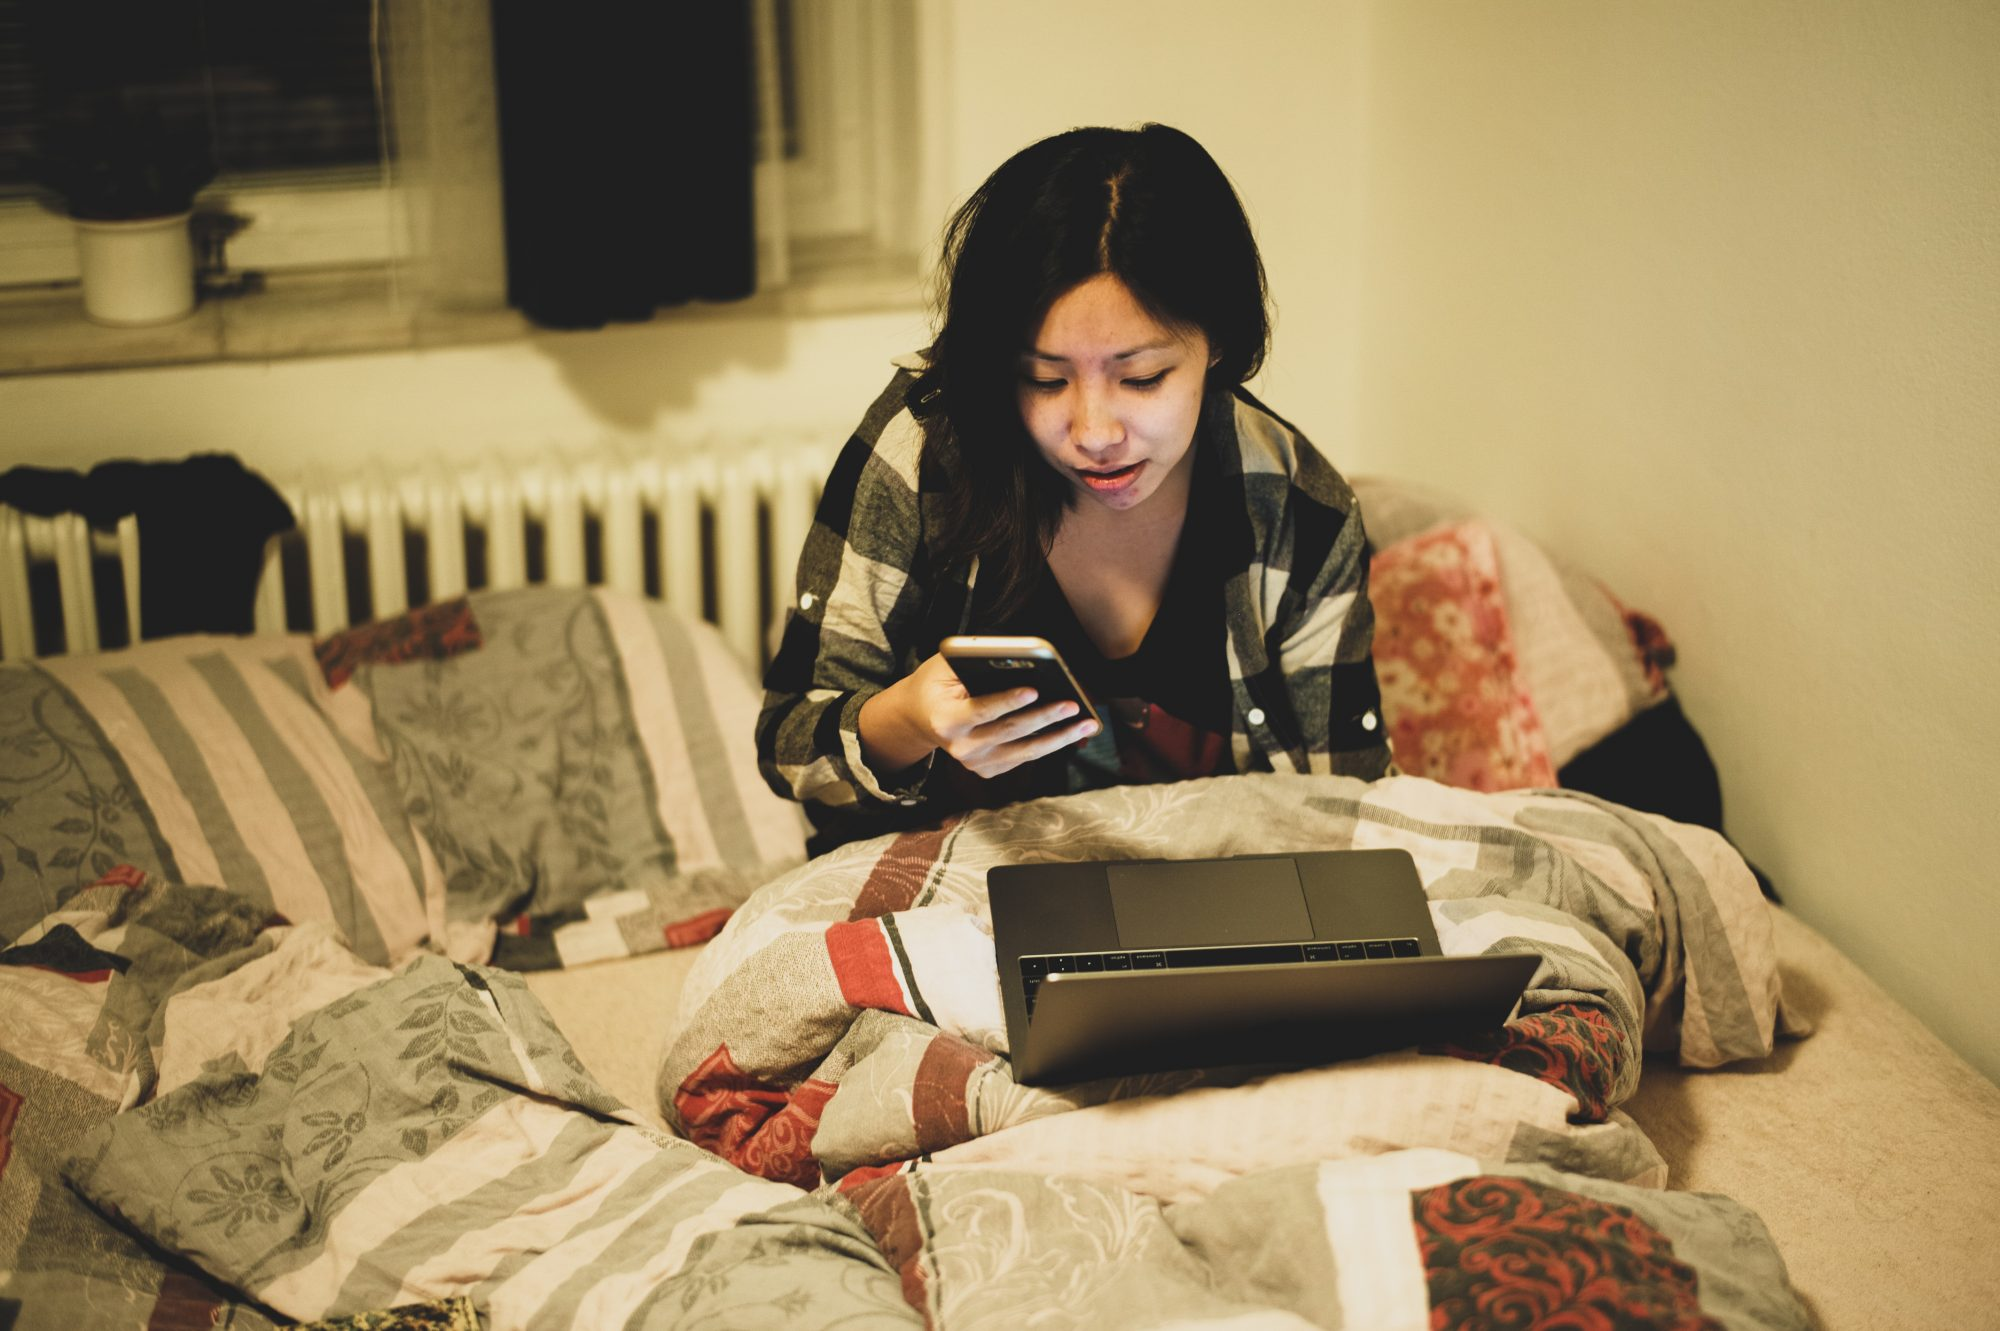 Cindy at work in bed. PRAGUE, 2017